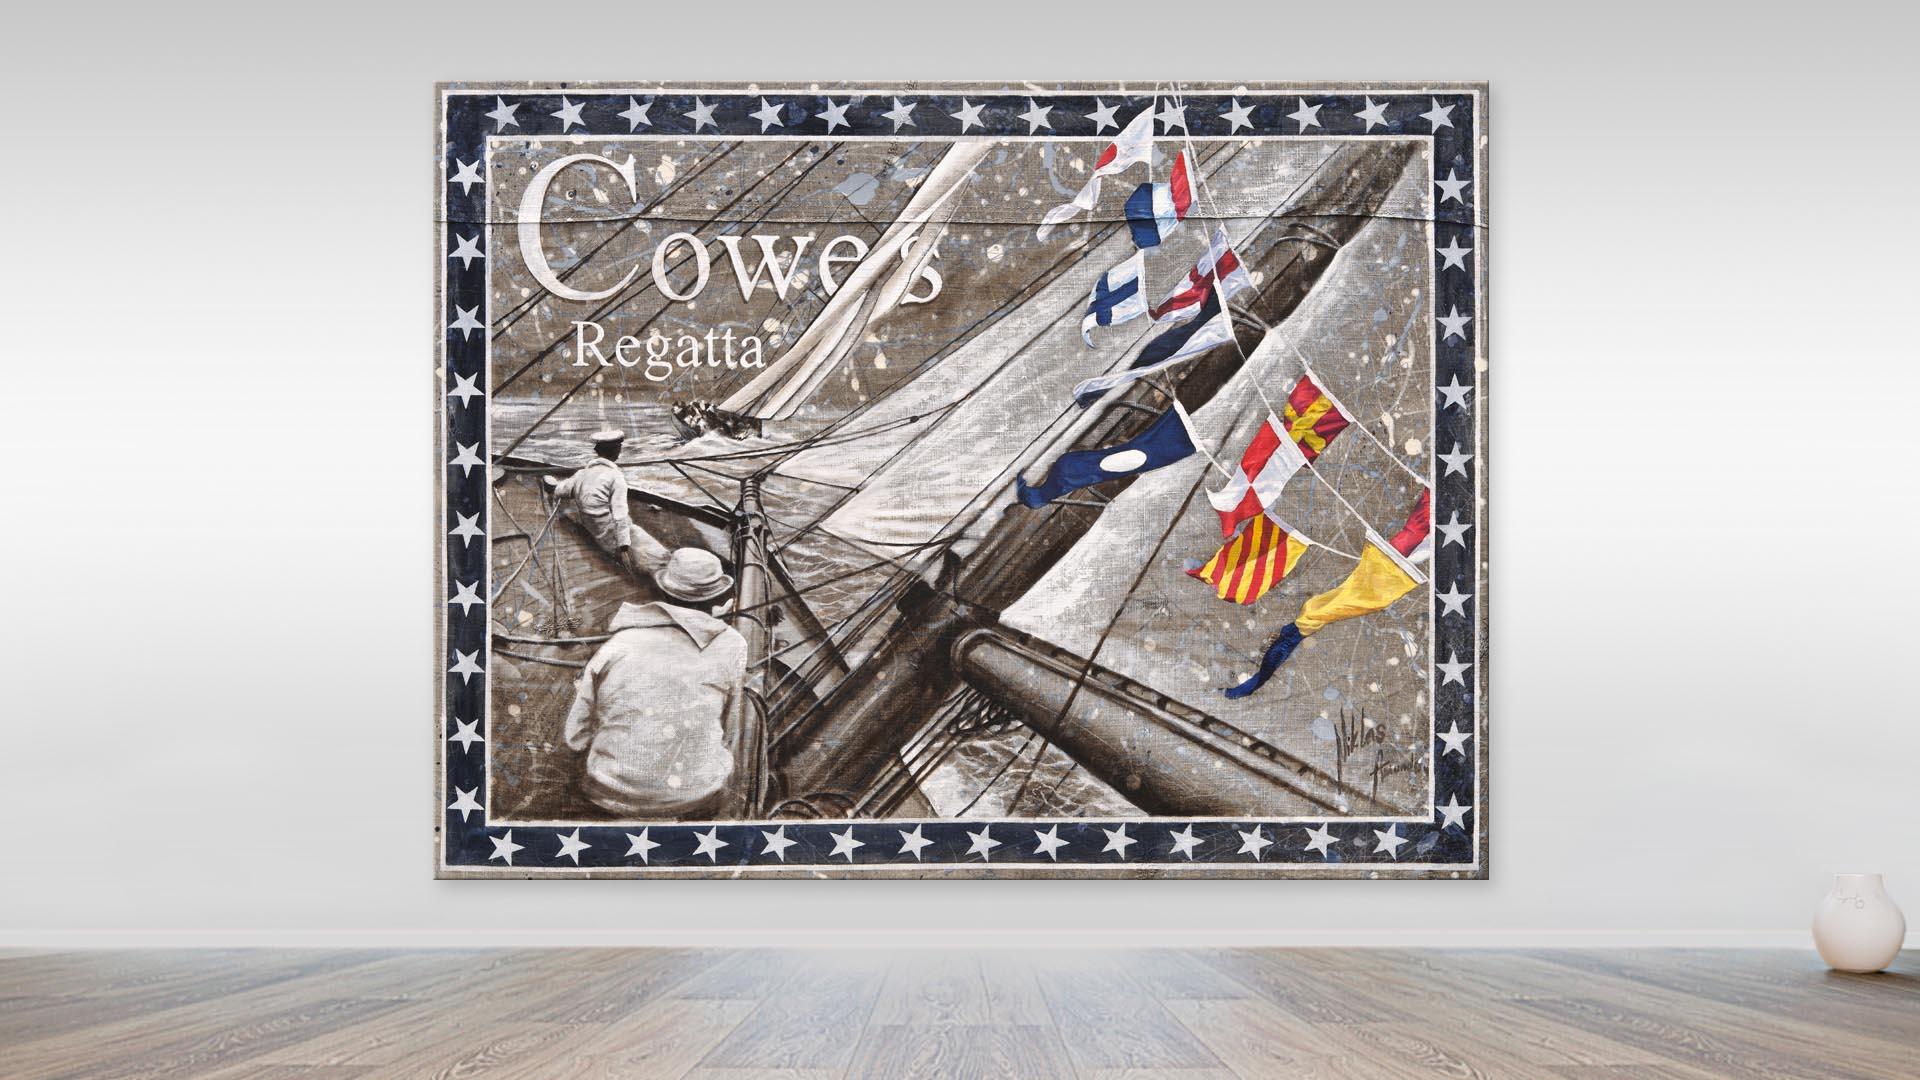 Cowes Regatta